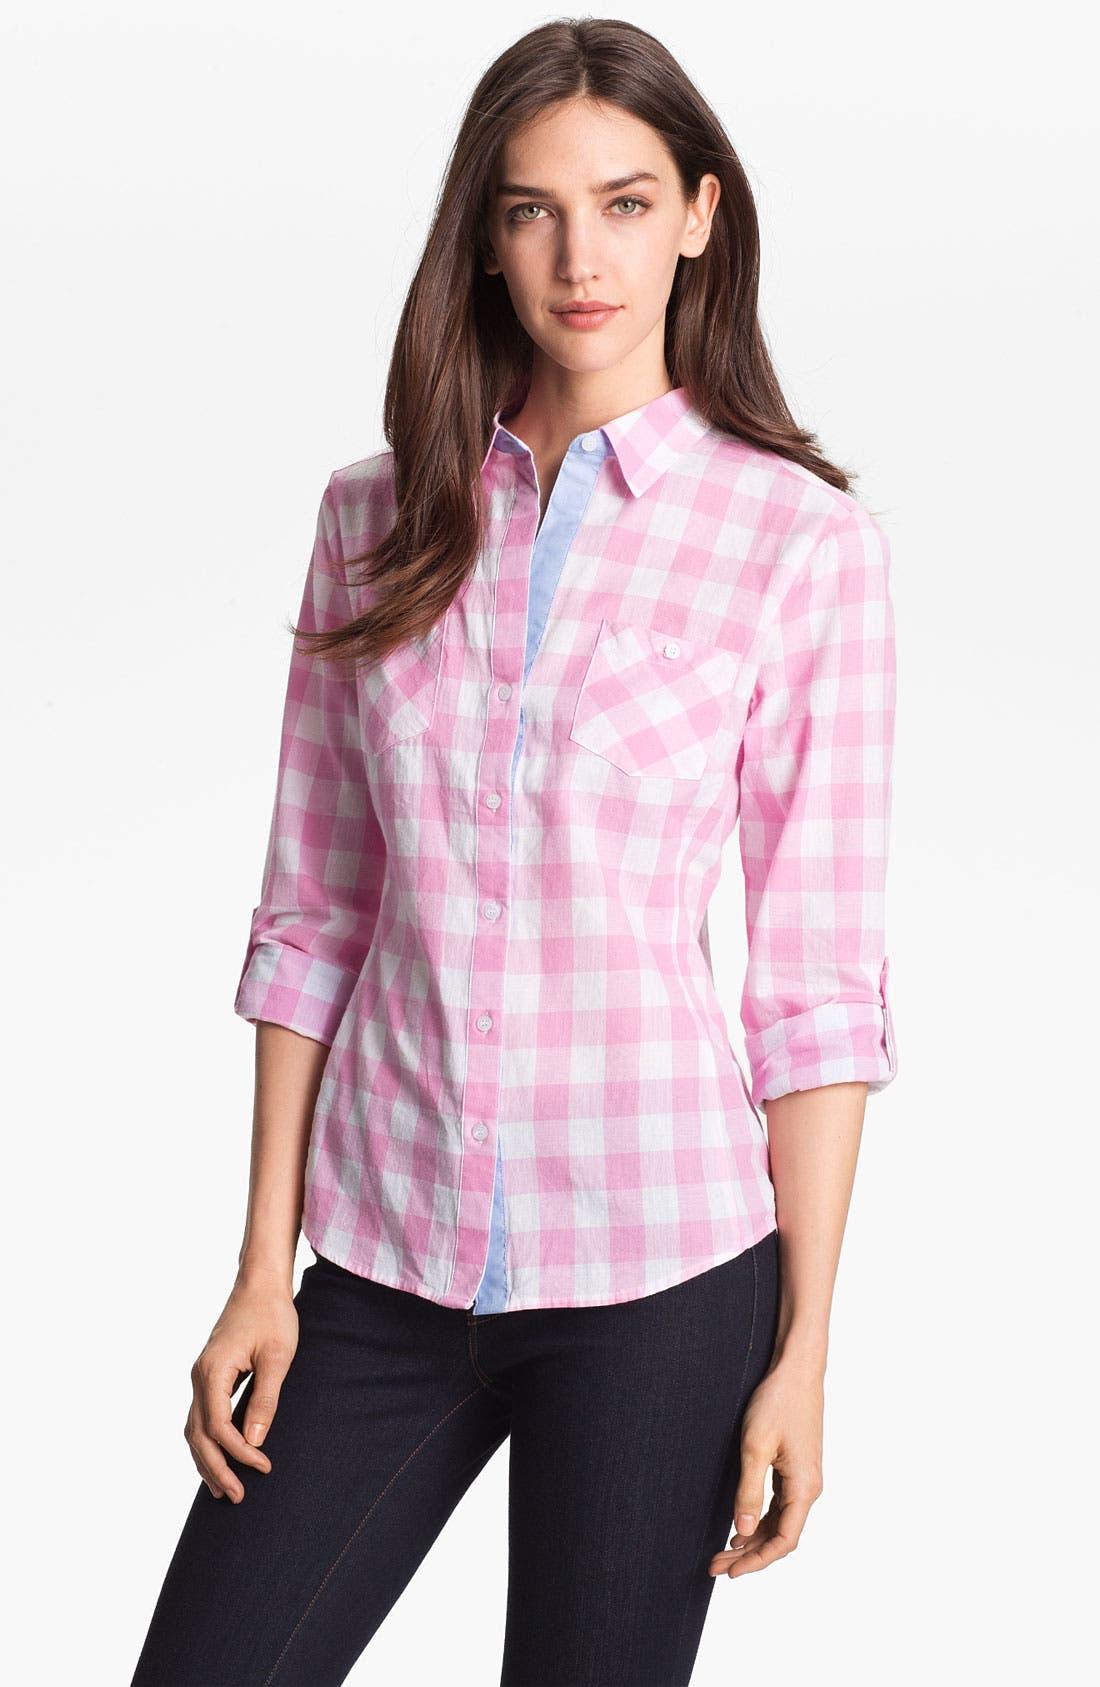 Alternate Image 1 Selected - Sandra Ingrish Roll Sleeve Check Shirt (Petite)